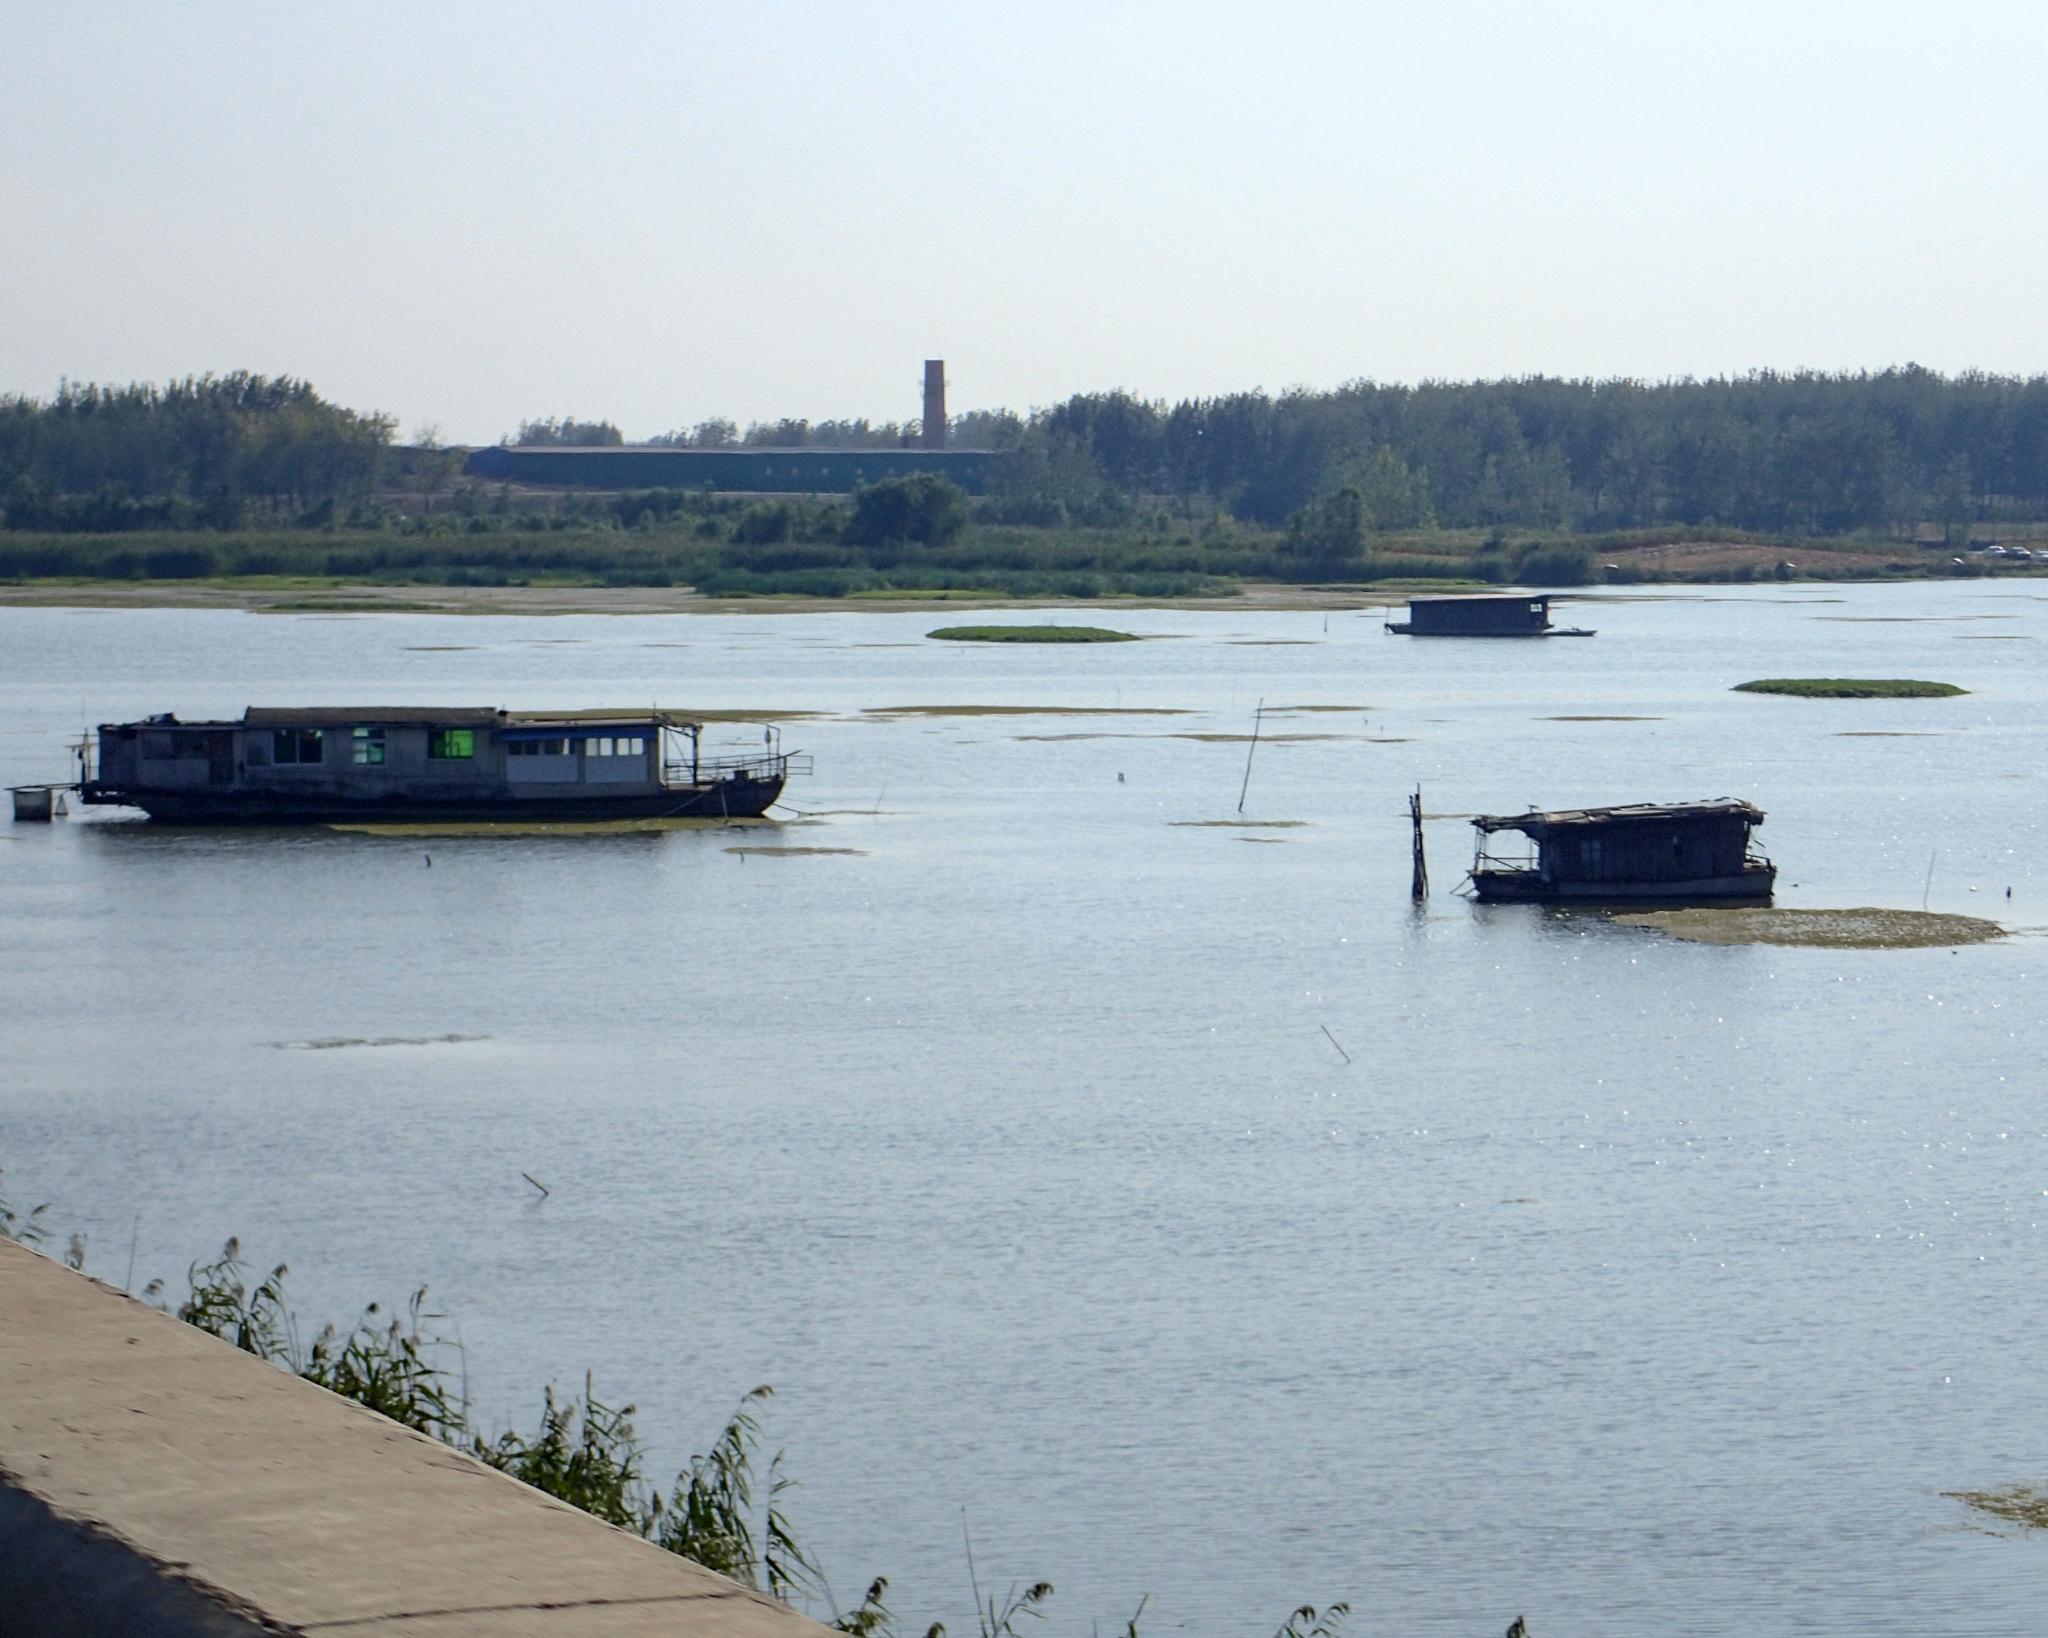 The Huaihe river on the apparoach to Bengbu